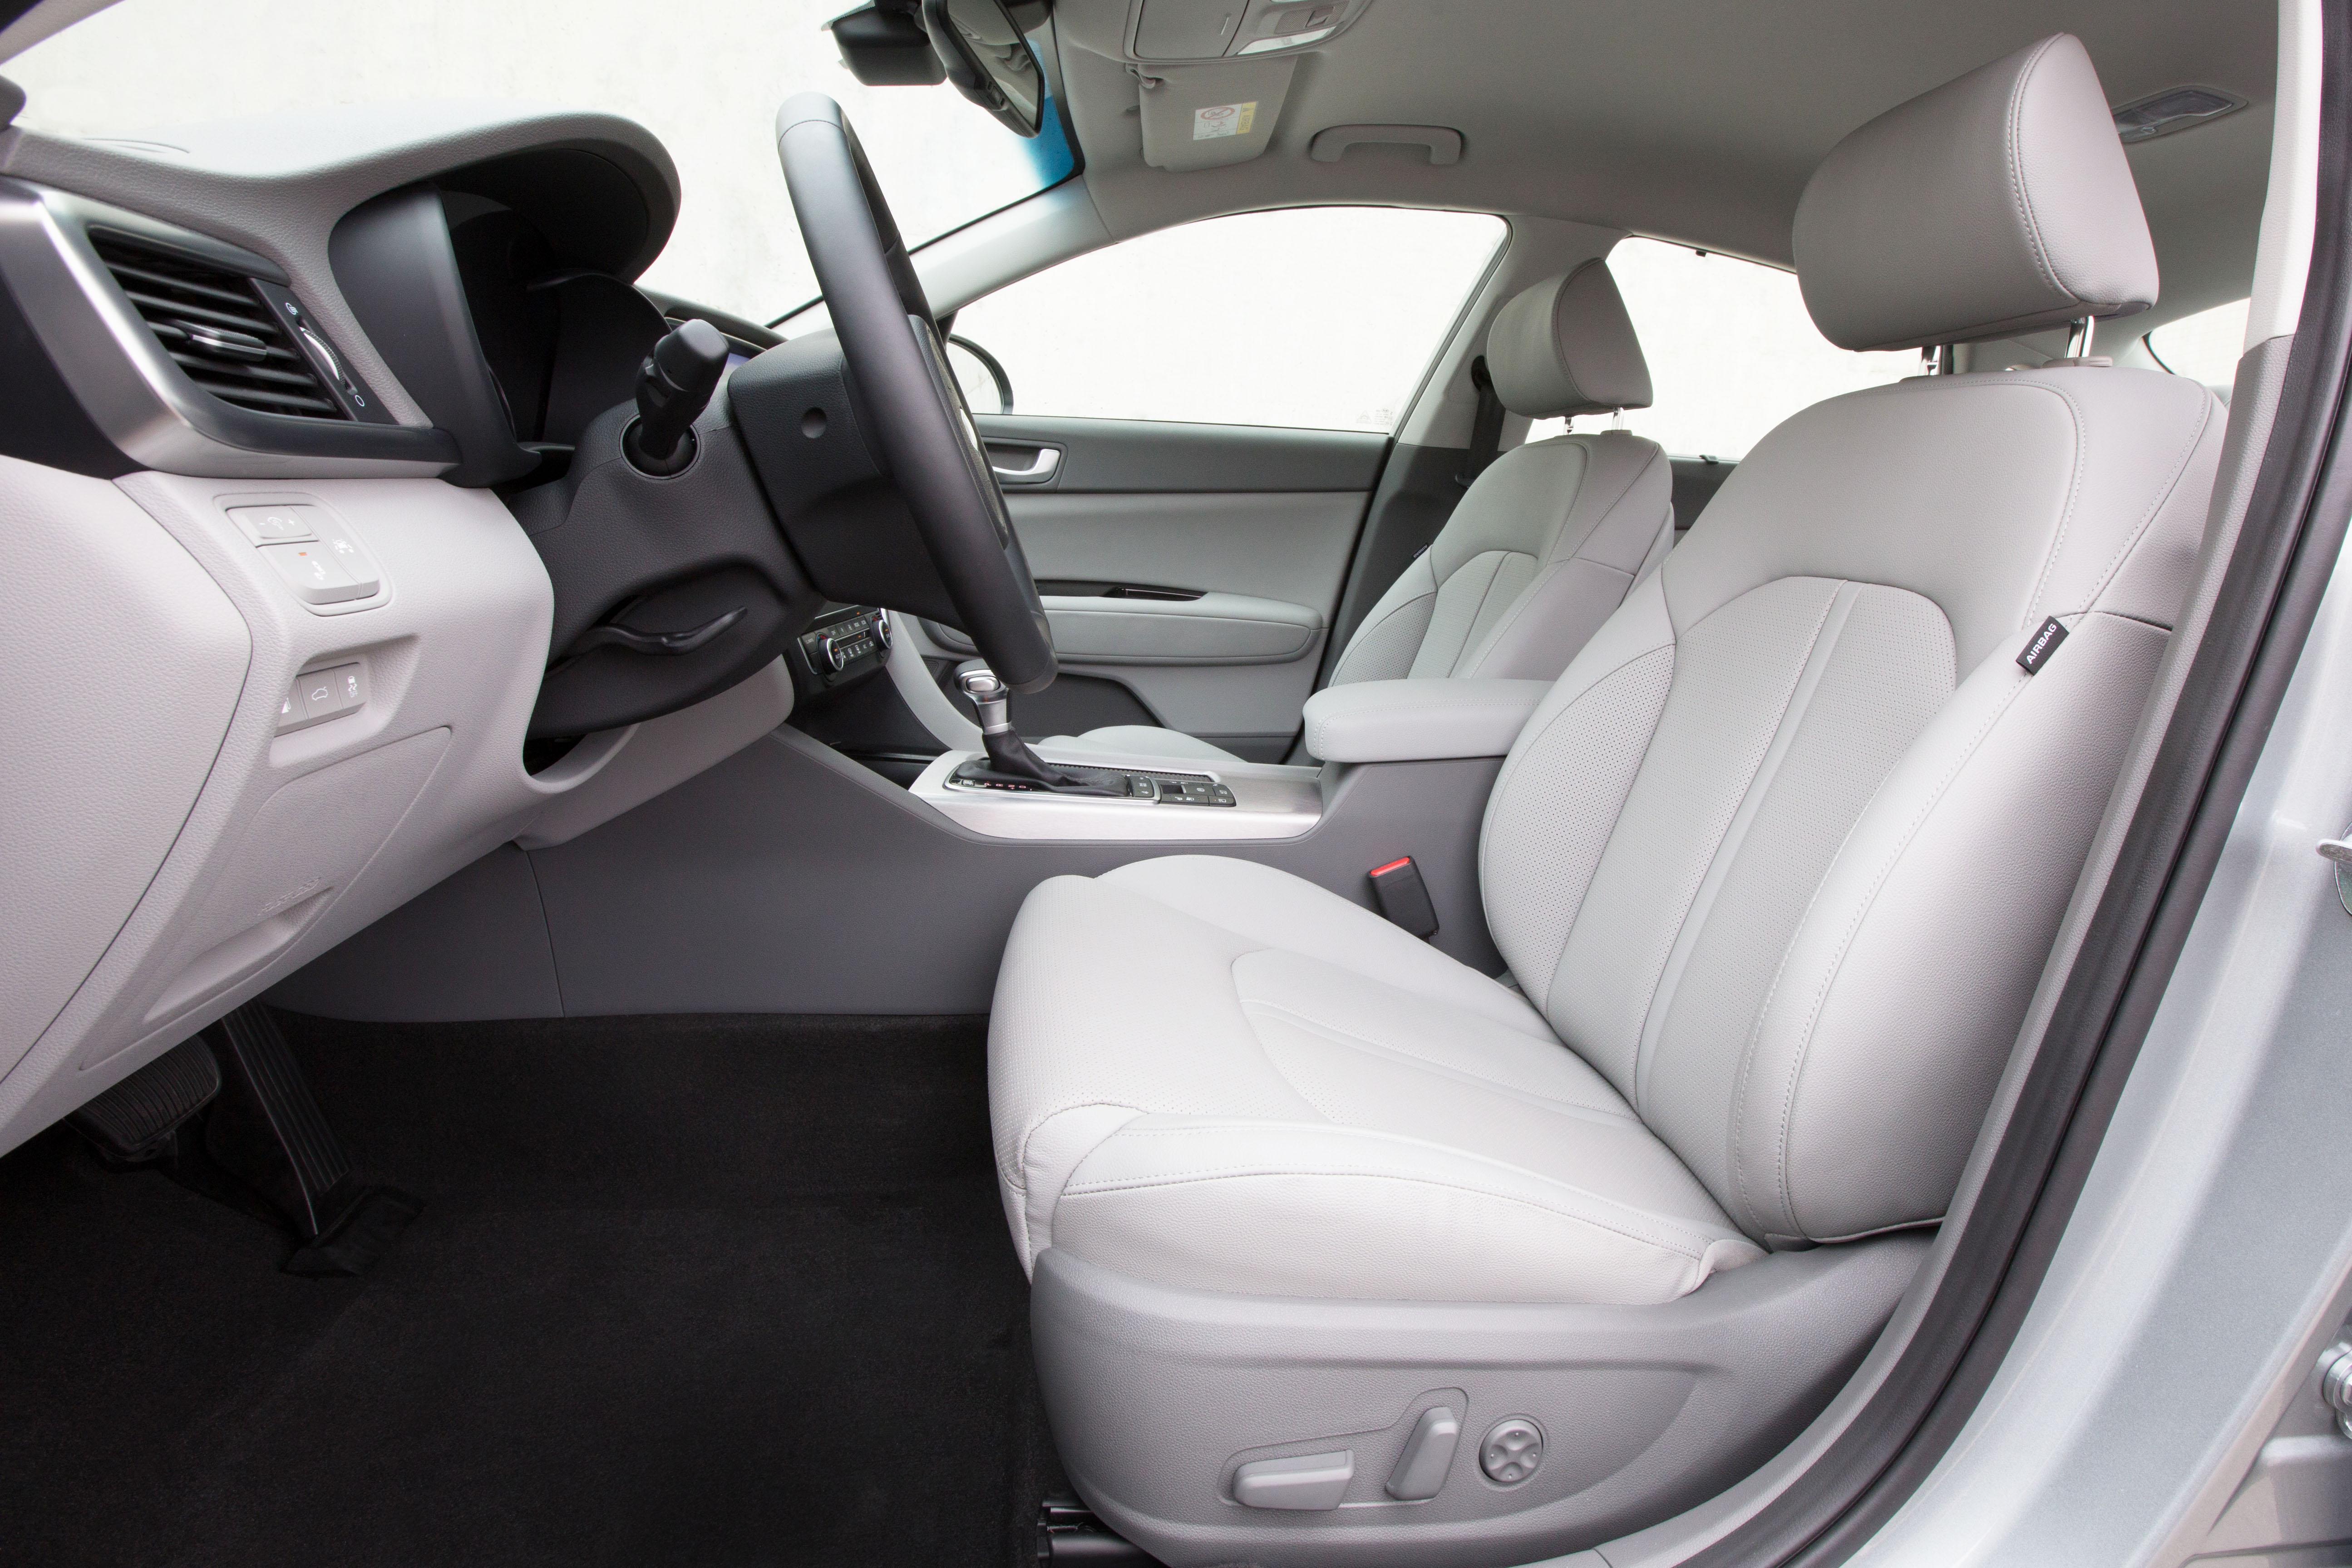 Kia Optima Plug In Hybrid Interior 03 Jpg